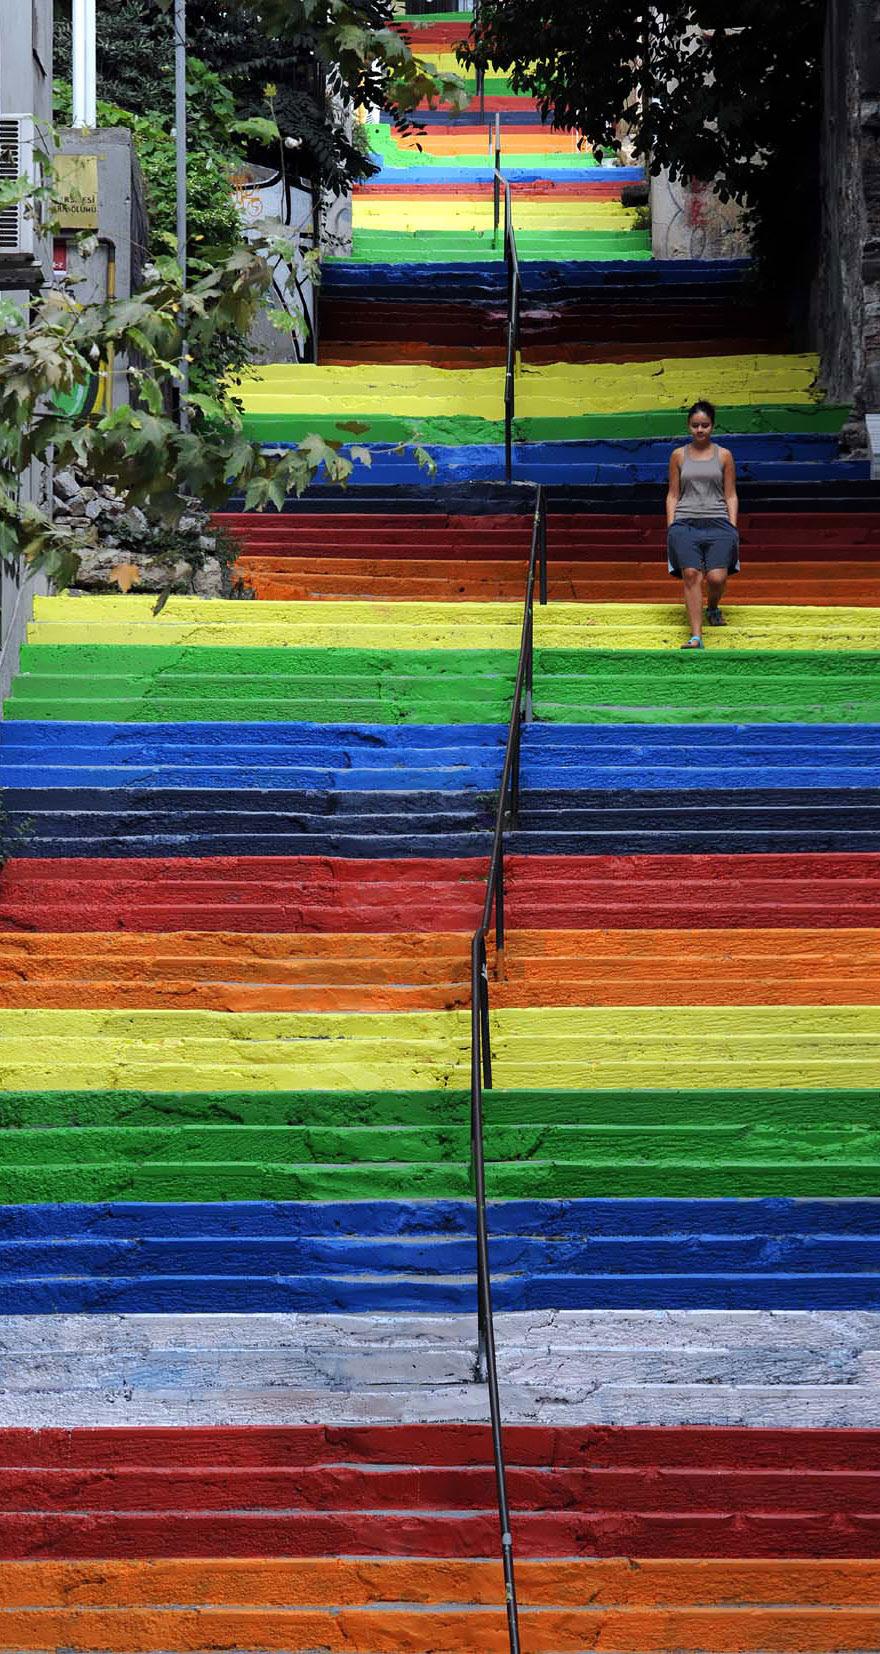 http://www.boredpanda.com/most-beautiful-steps-stairs-street-art/?image_id=creative-stairs-street-art-15-1.jpg